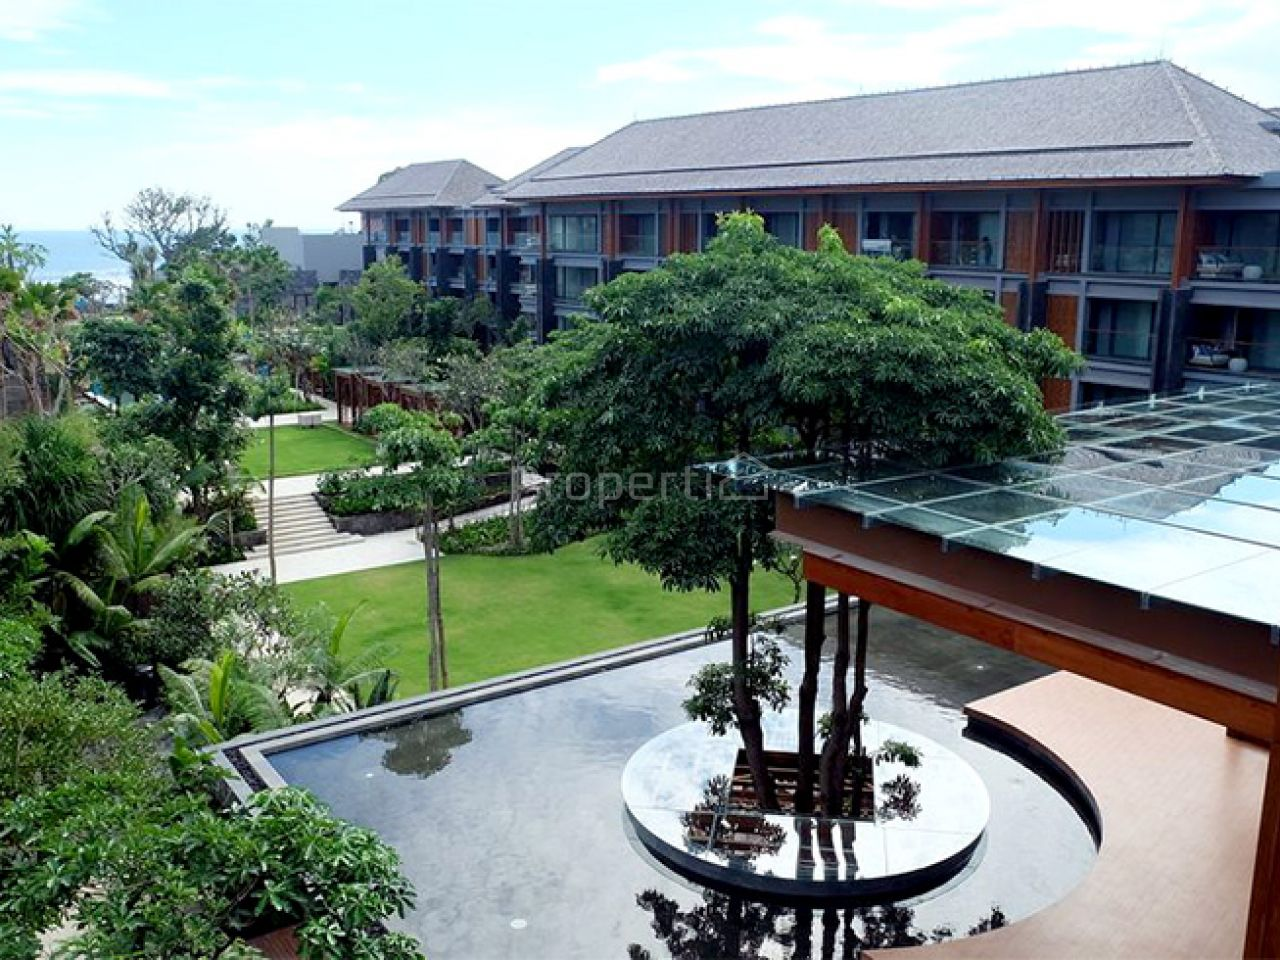 Hotel Baru di Seminyak Bali, Kab. Badung